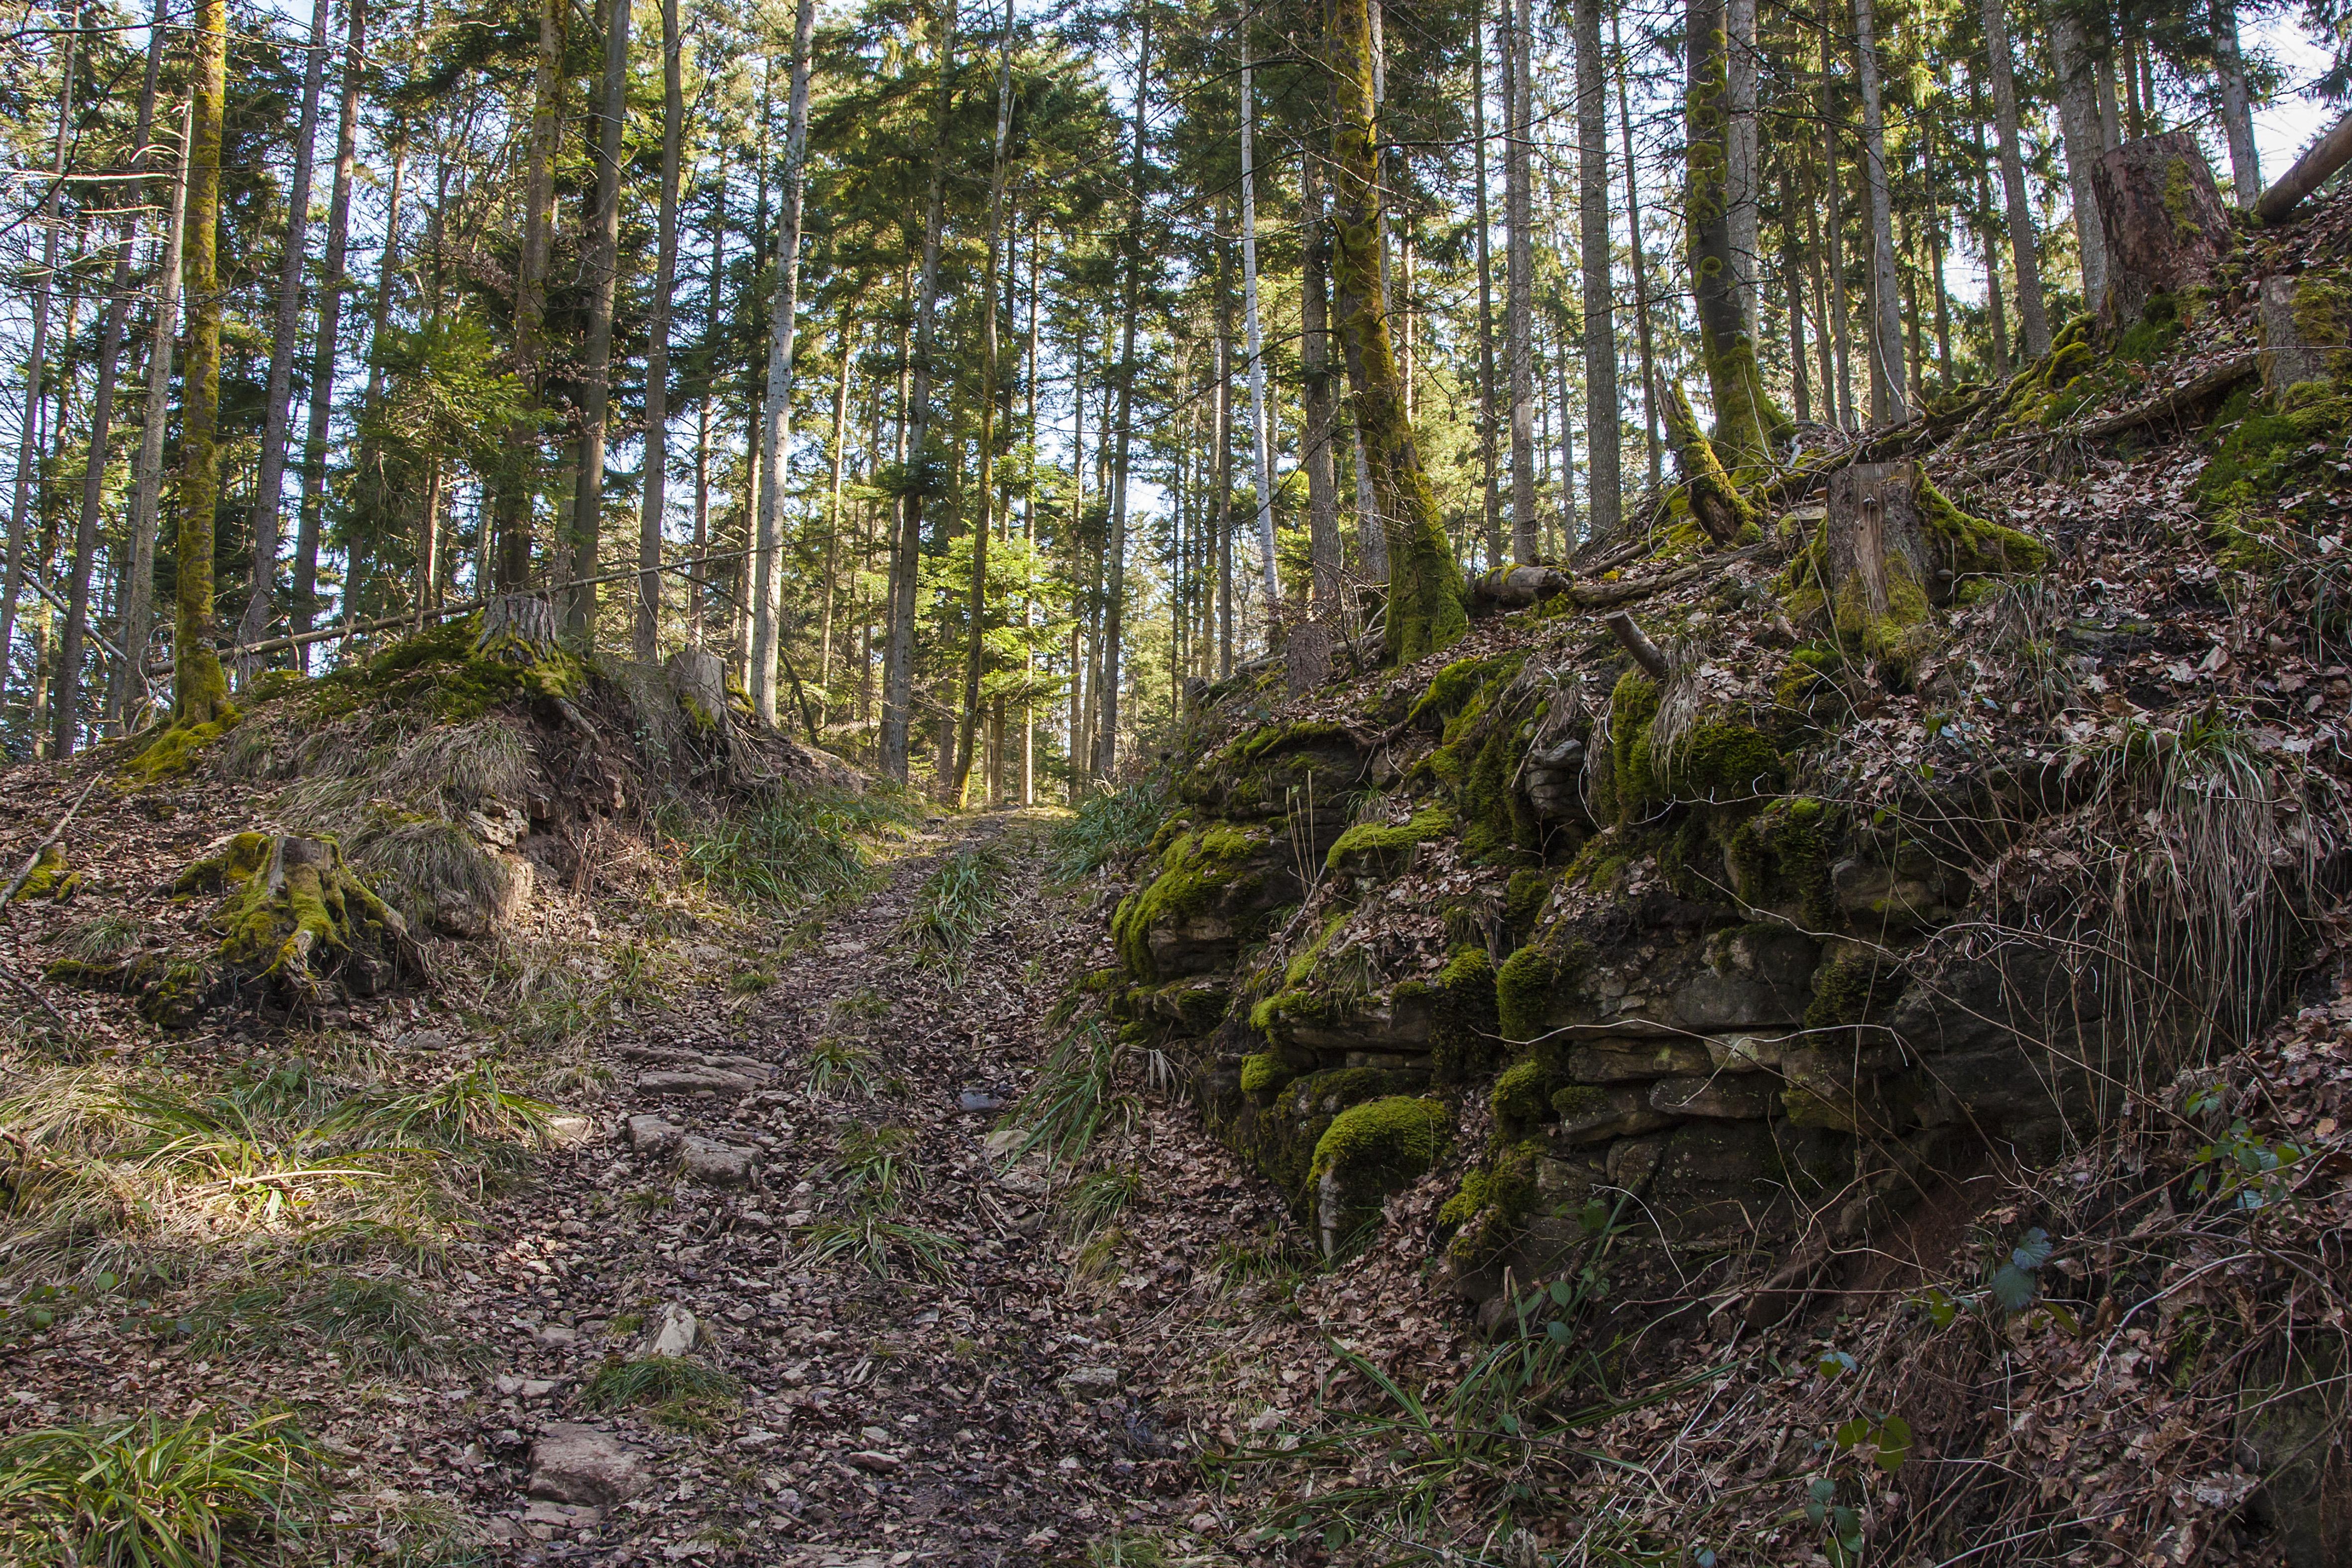 Mildersbachtalrundweg